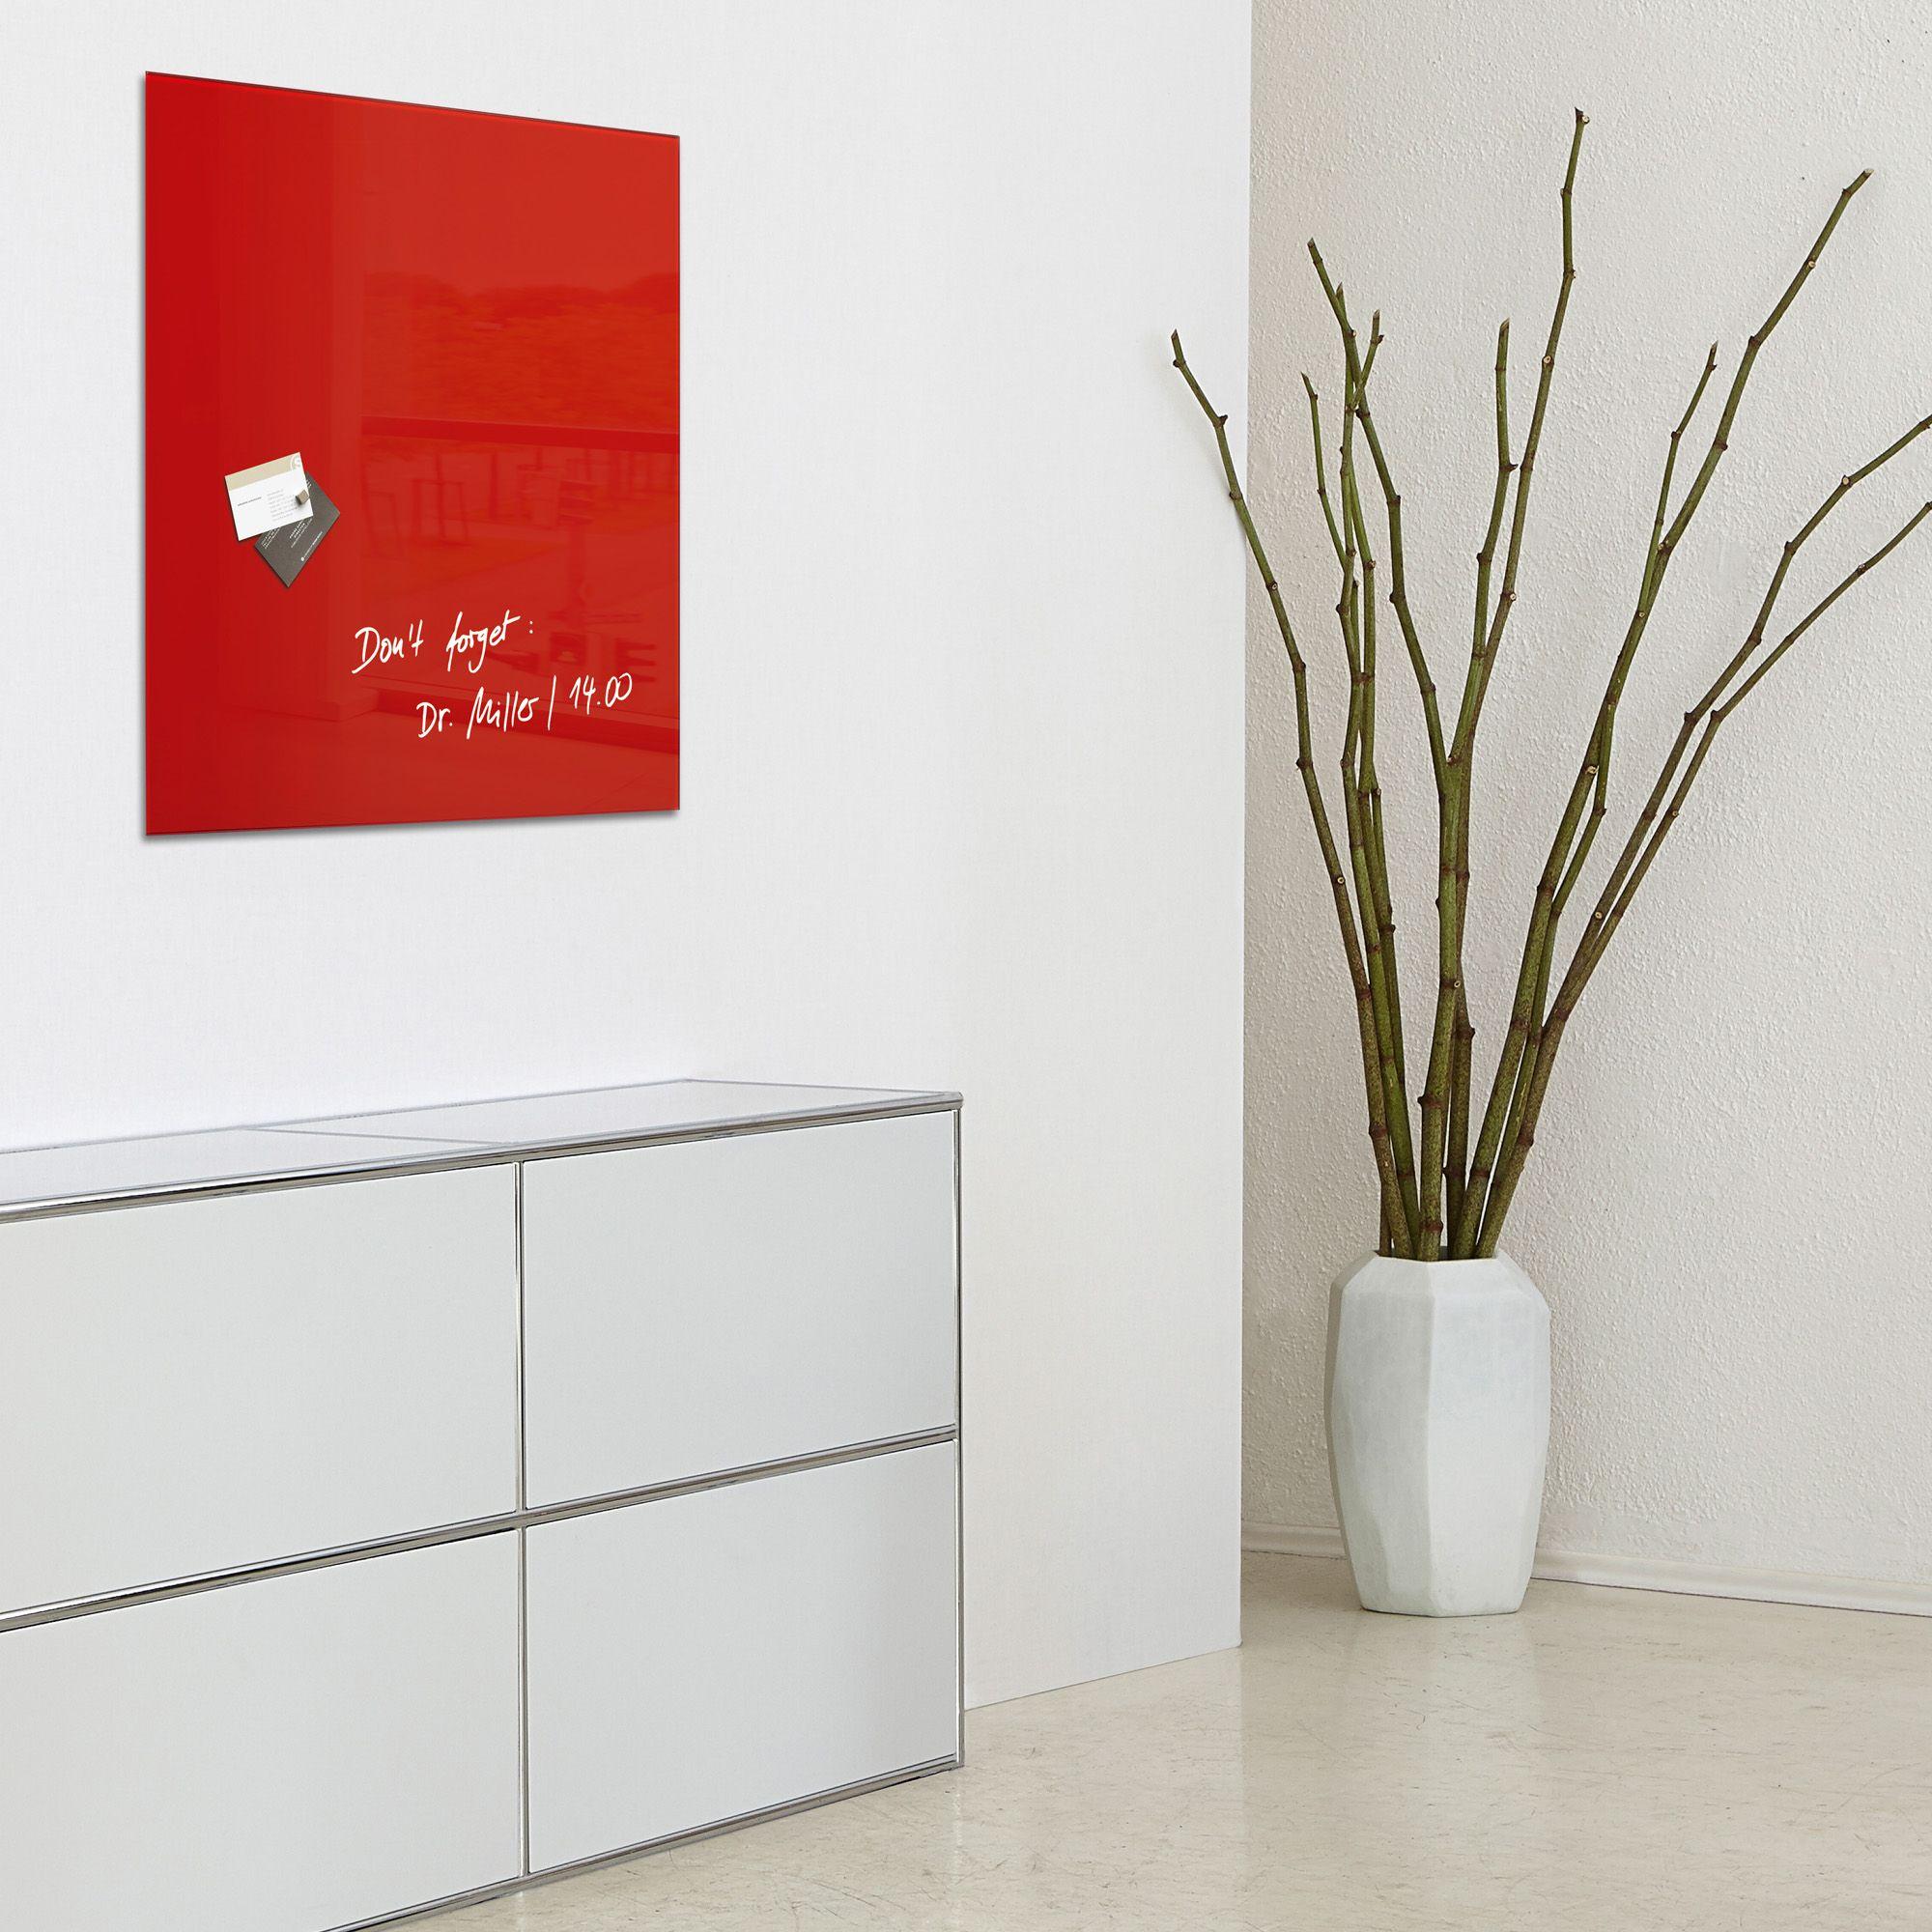 Vernice Lavagna Magnetica Colorata lavagna magnetica in vetro 48x48cm rosso artverum® sigel rgl114  4004360887703